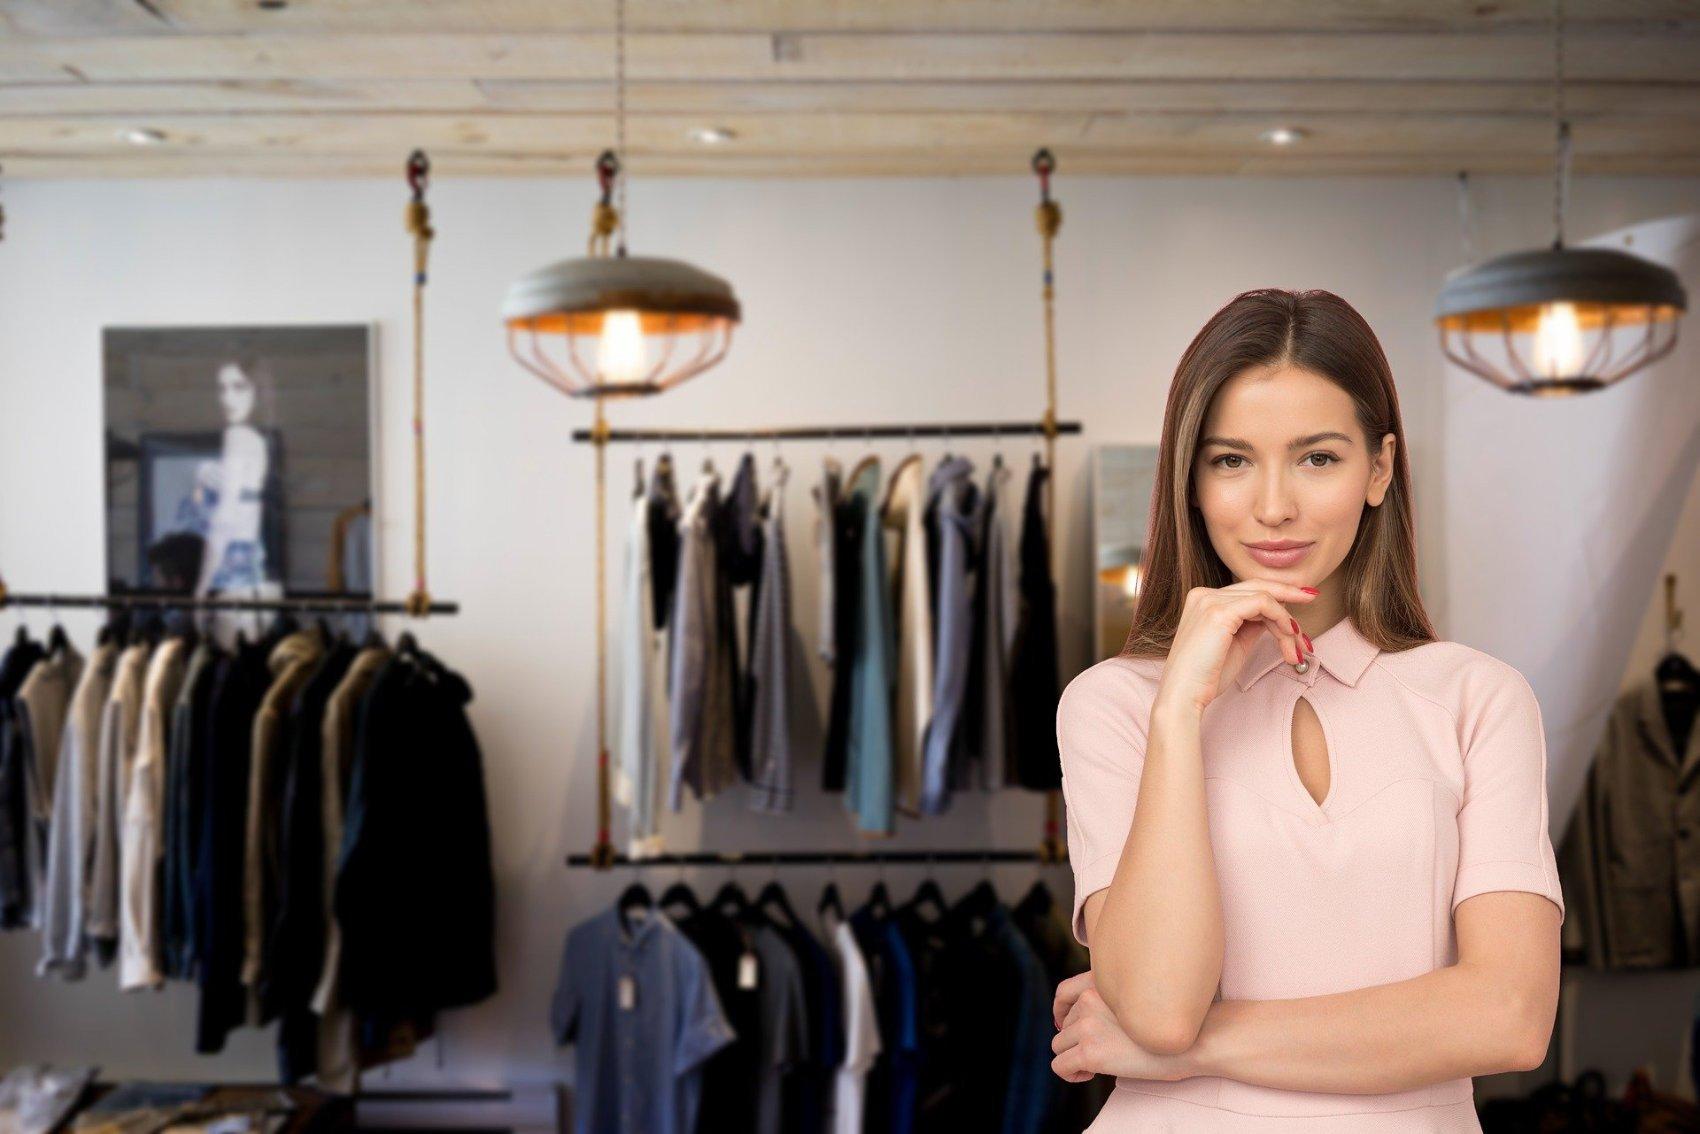 Woman Entrepreneur - Image by Tumisu